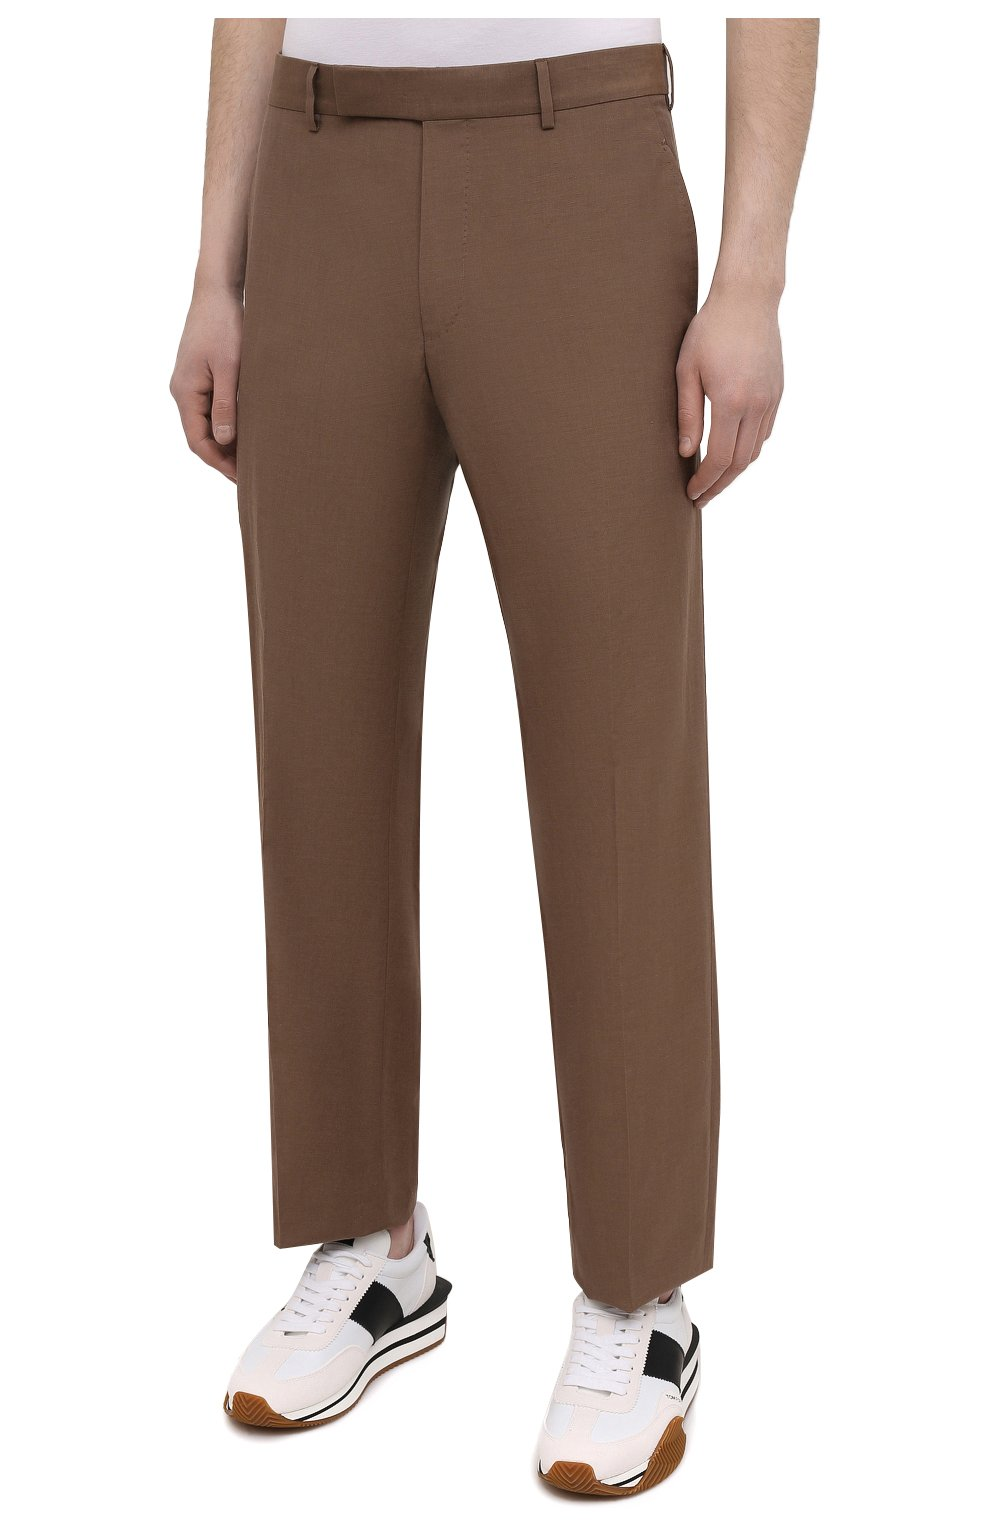 Мужские брюки из шелка и льна TOM FORD коричневого цвета, арт. 976R15/759242   Фото 3